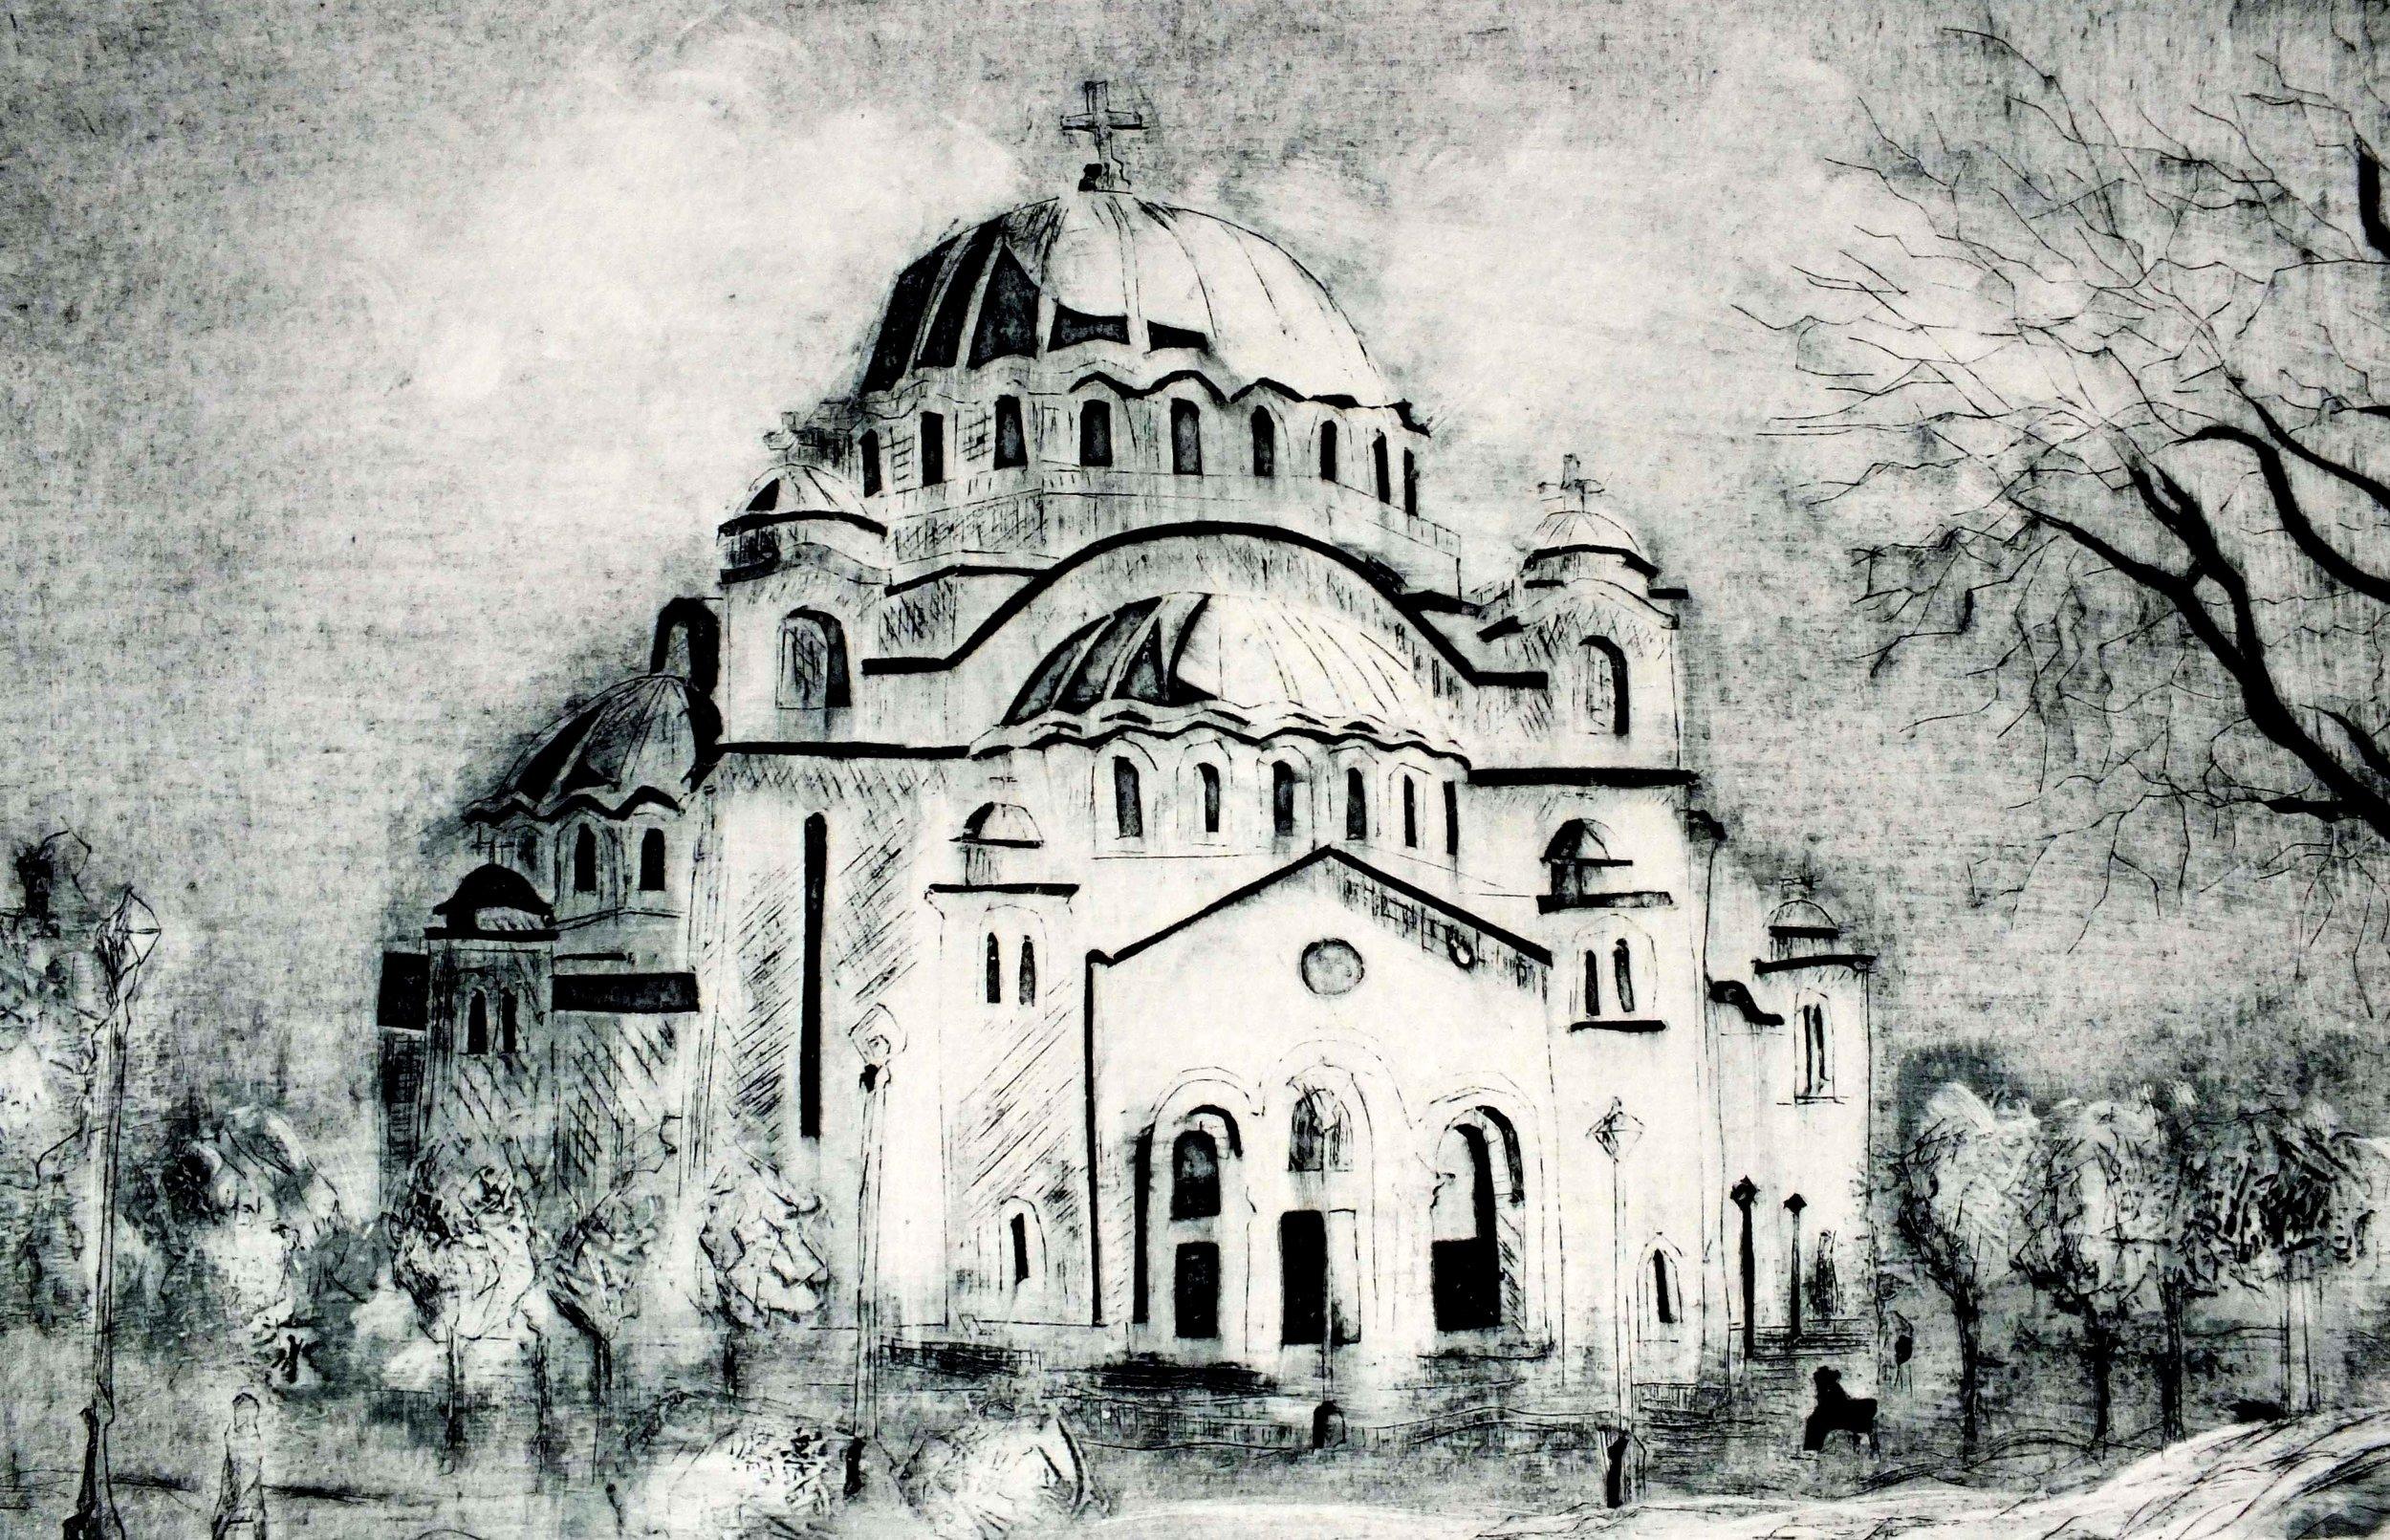 St Sava Church, Belgrade, Collagraph print by Ali Savic